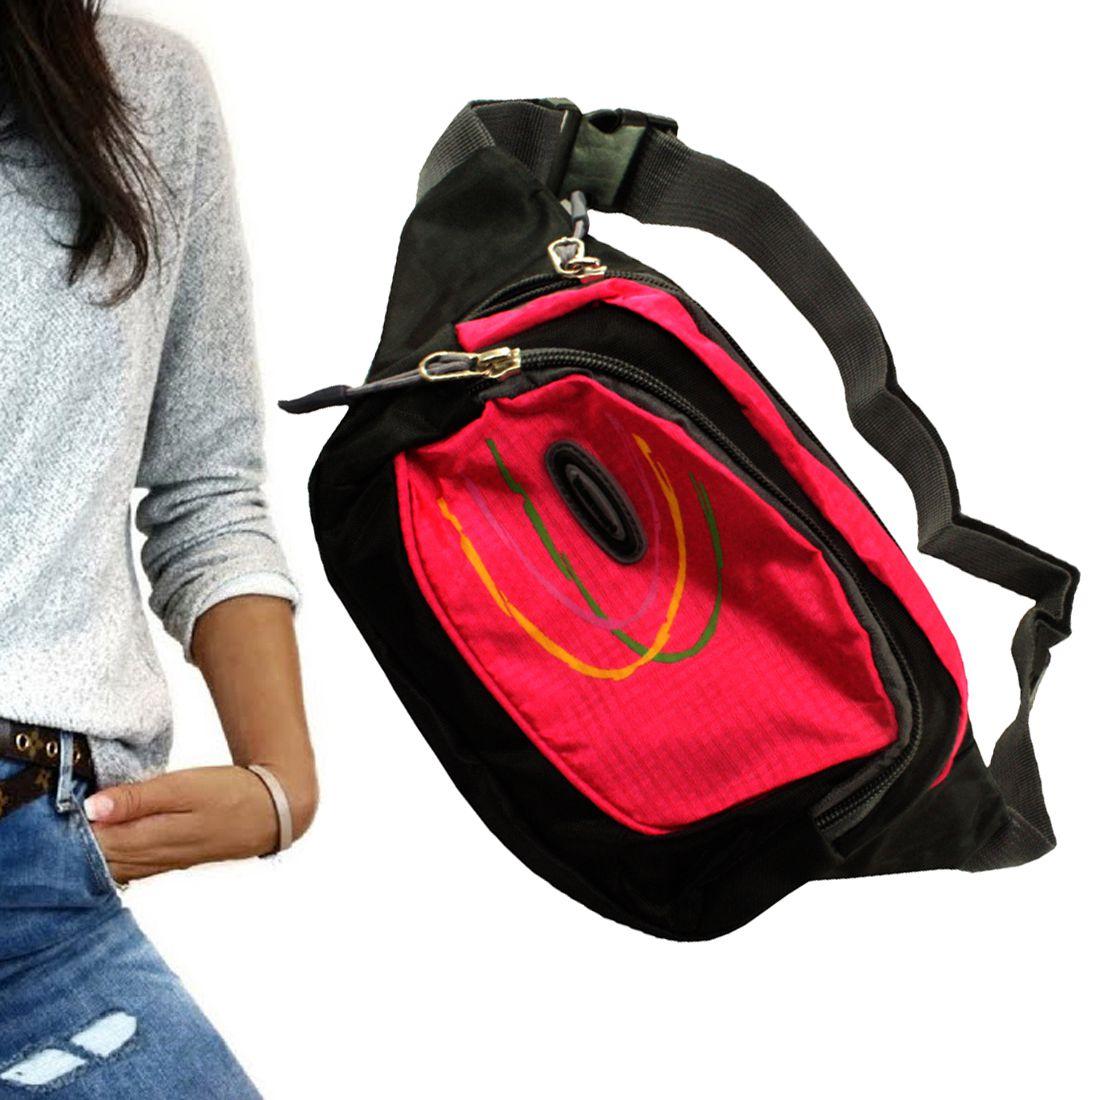 SJ Multi-Pocket Army Waist Bag Travel Hiking Camping Nylon Pink Passport  Holder - Buy SJ Multi-Pocket Army Waist Bag Travel Hiking Camping Nylon  Pink ... 149ce0ce5d